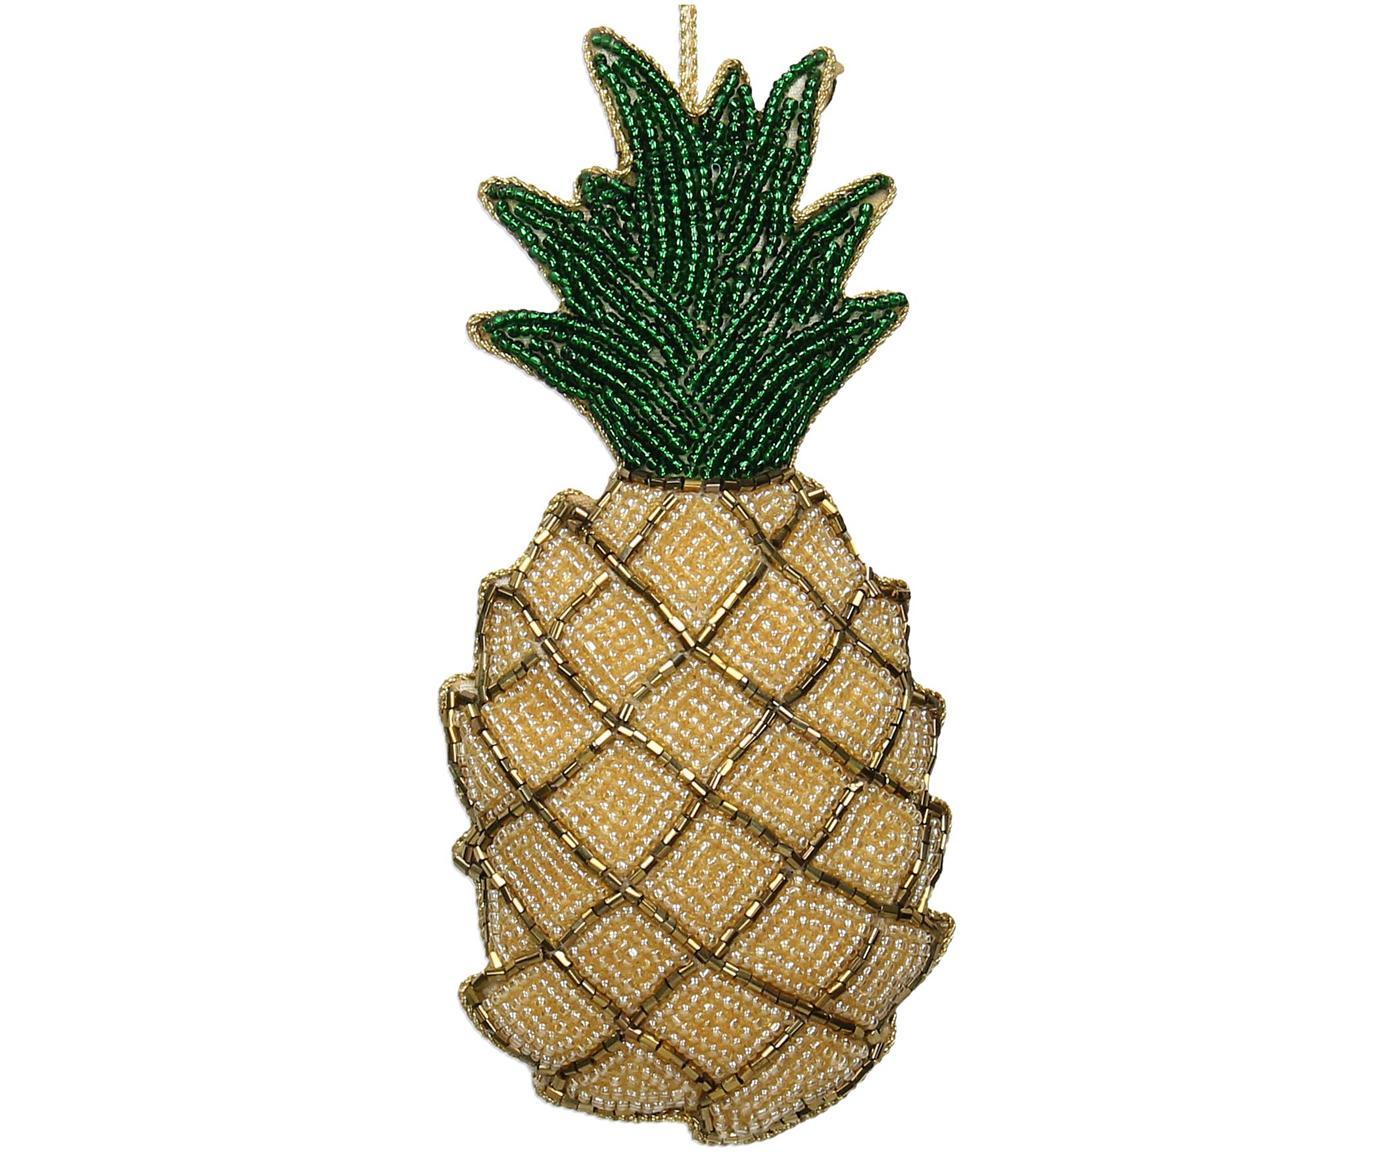 Baumanhänger Pineapple, Gelb, Grün, Goldfarben, 7 x 16 cm